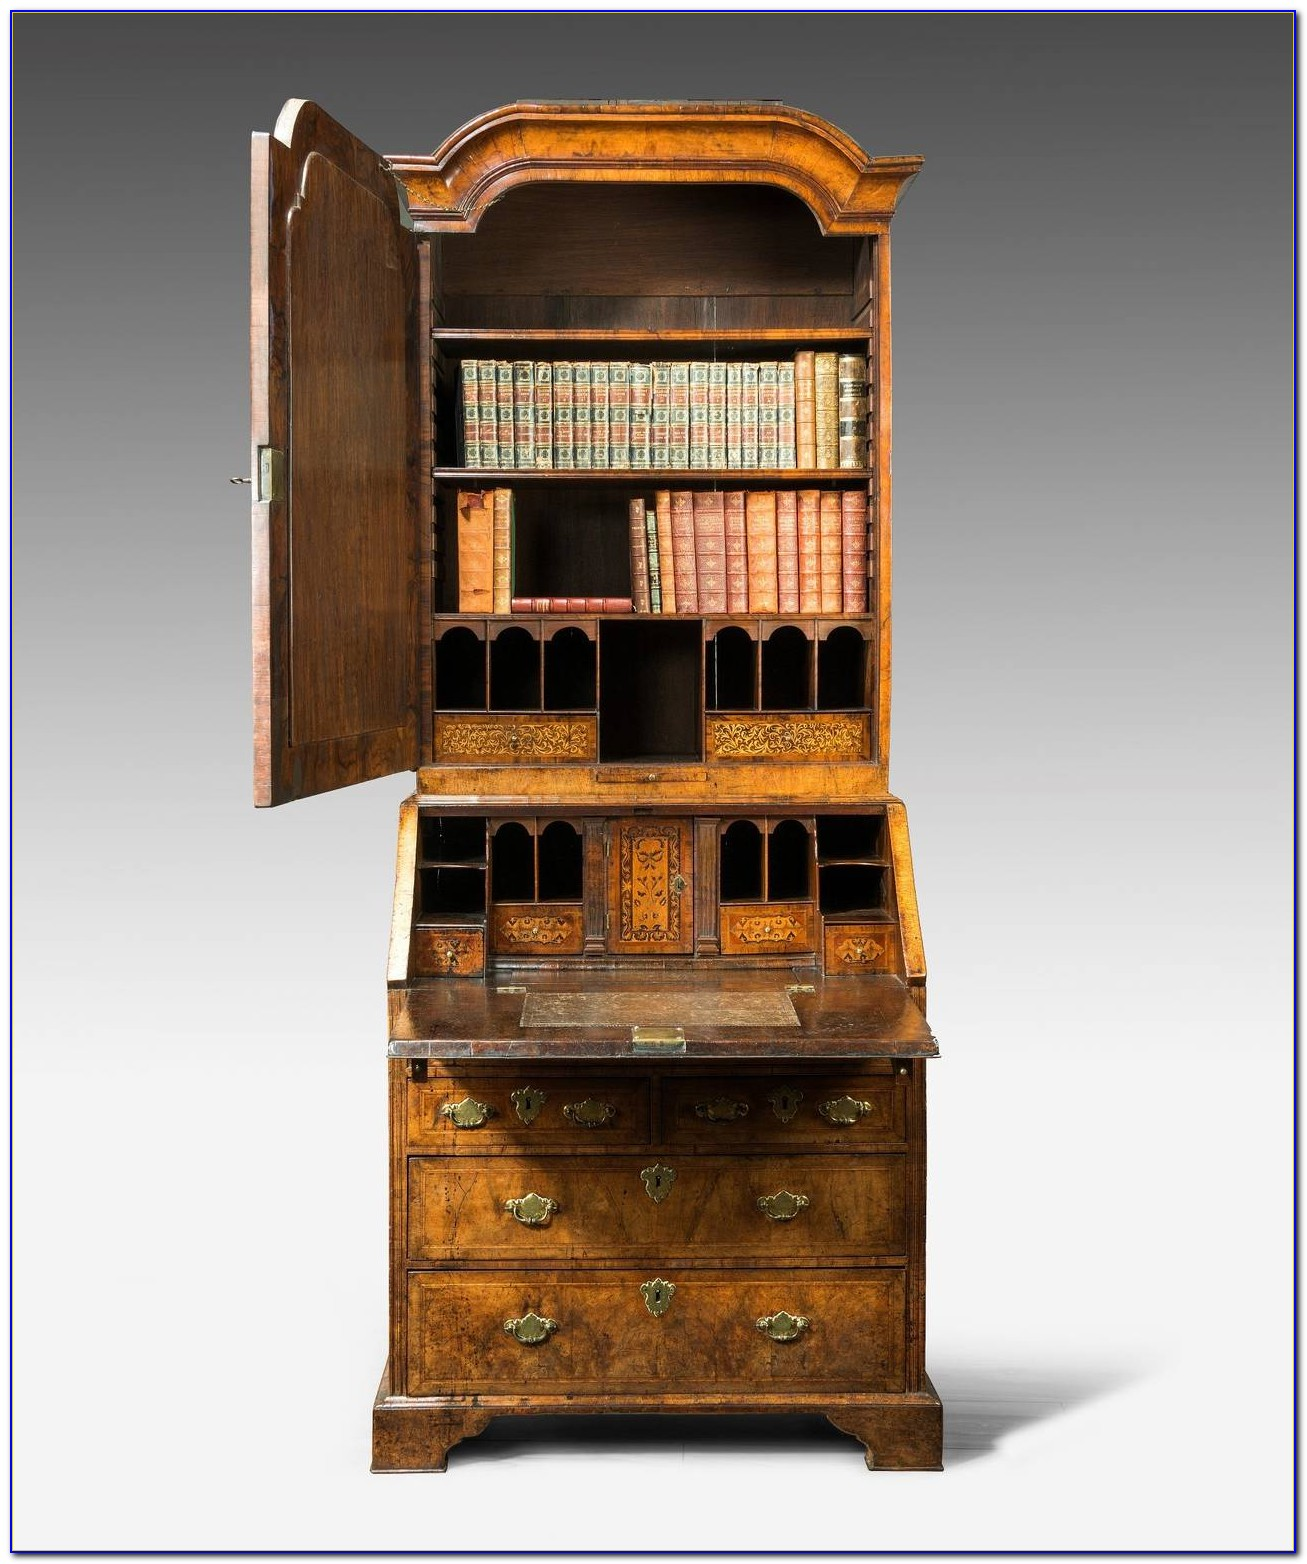 Queen Anne Bookshelf